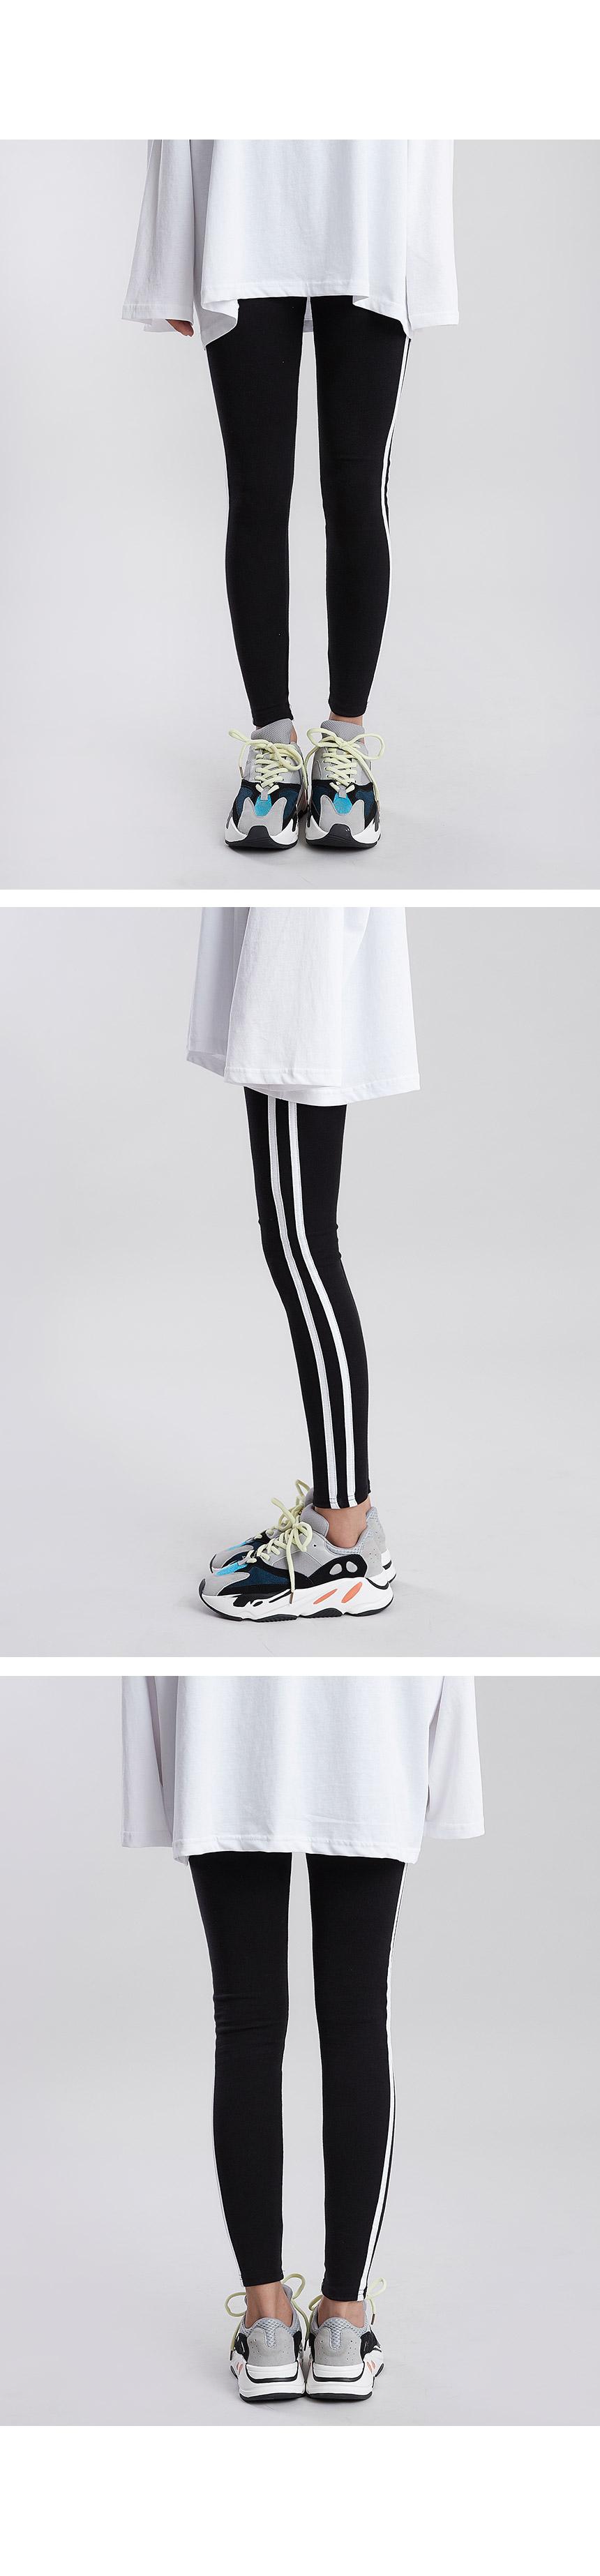 Double-line leggings